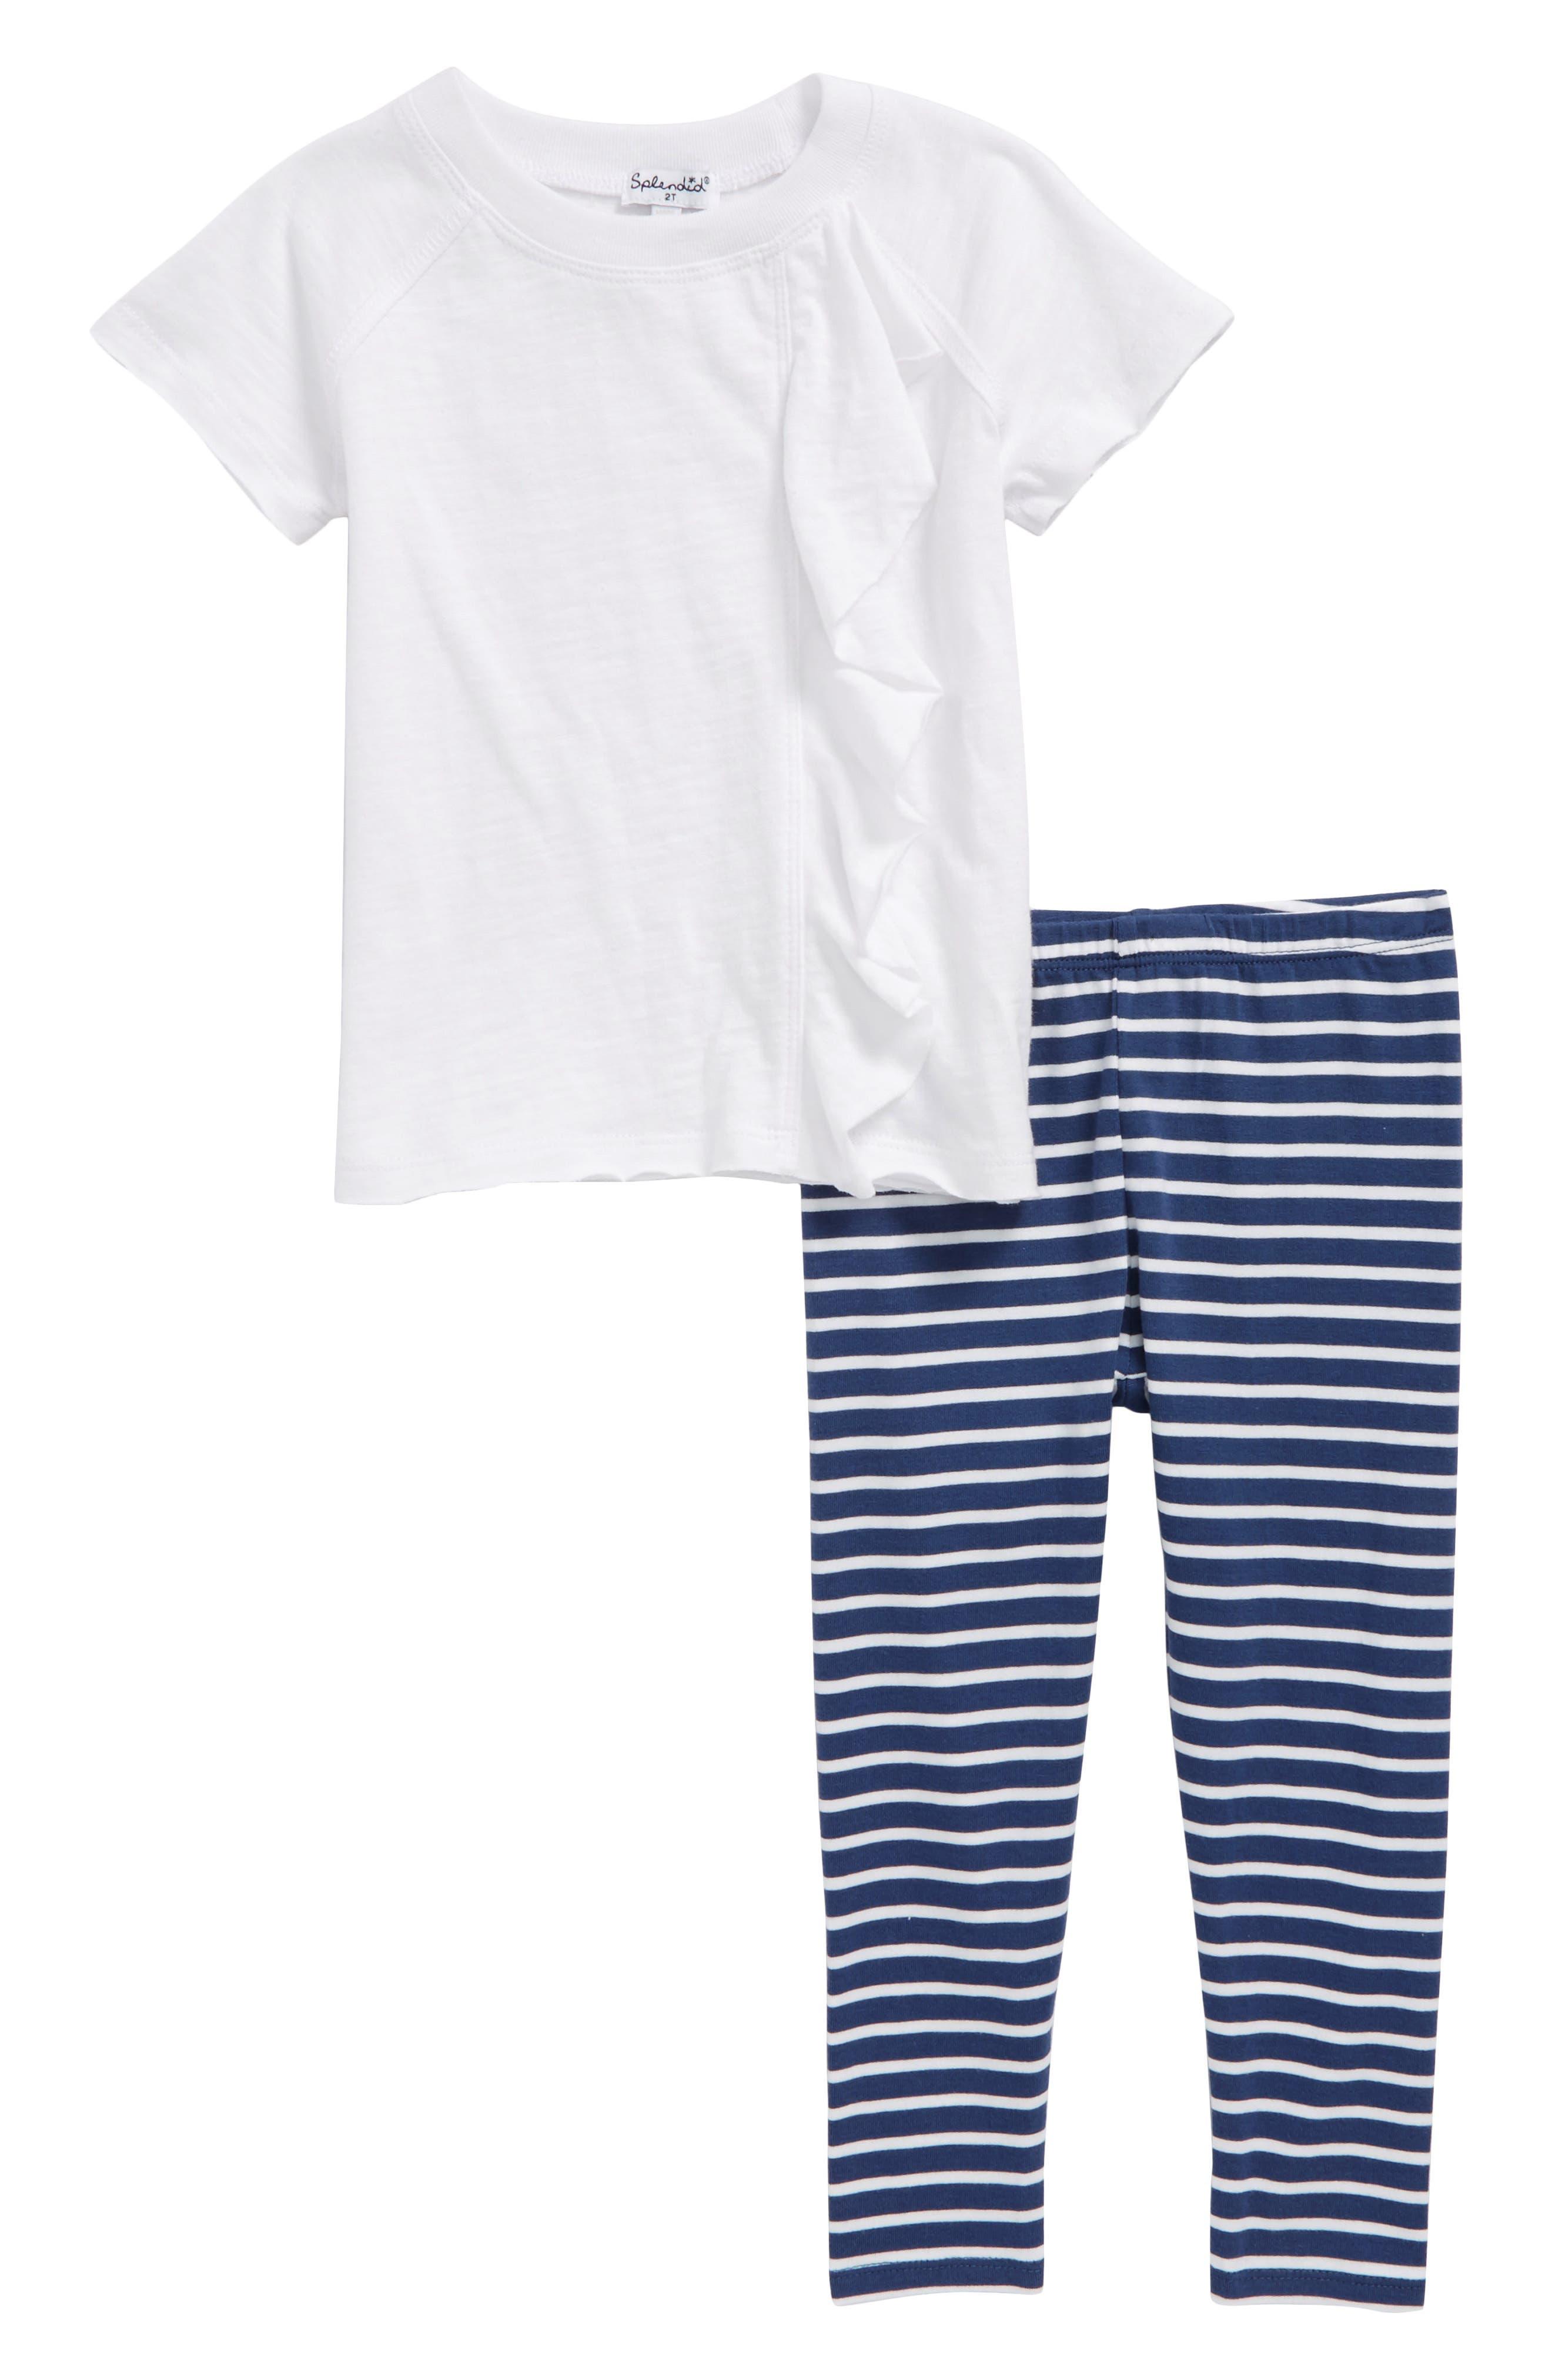 Ruffle Top & Stripe Leggings Set,                             Main thumbnail 1, color,                             100